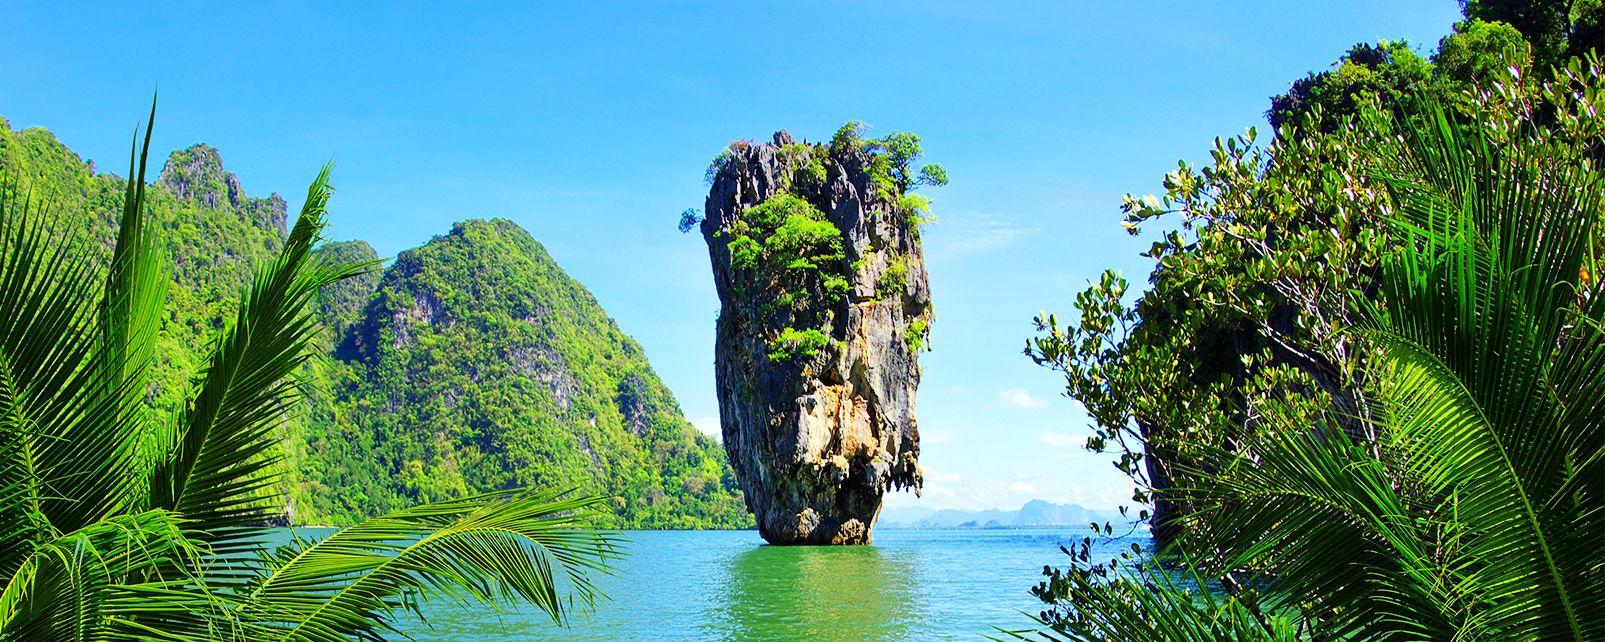 Phang Nga Bay, Landscapes, Khao Lak and the surrounding region, Thailand